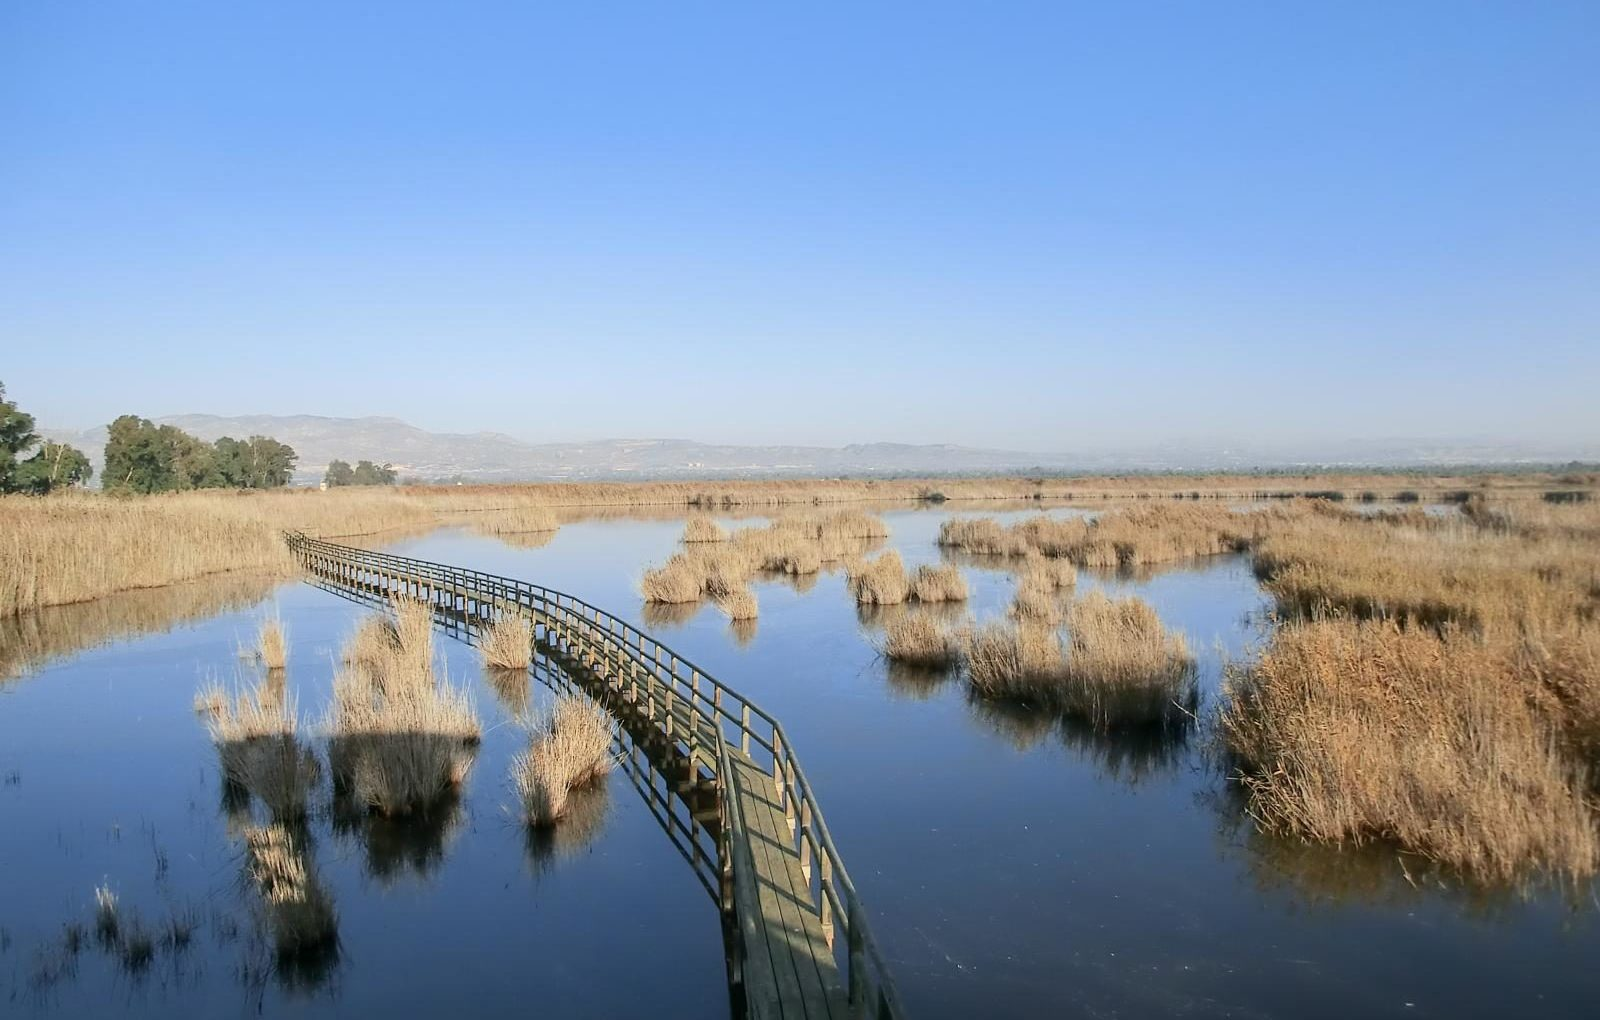 parquenaturalelhondo 1 e1588261461928 - Parque Natural El Hondo-Comunidad Valenciana-España